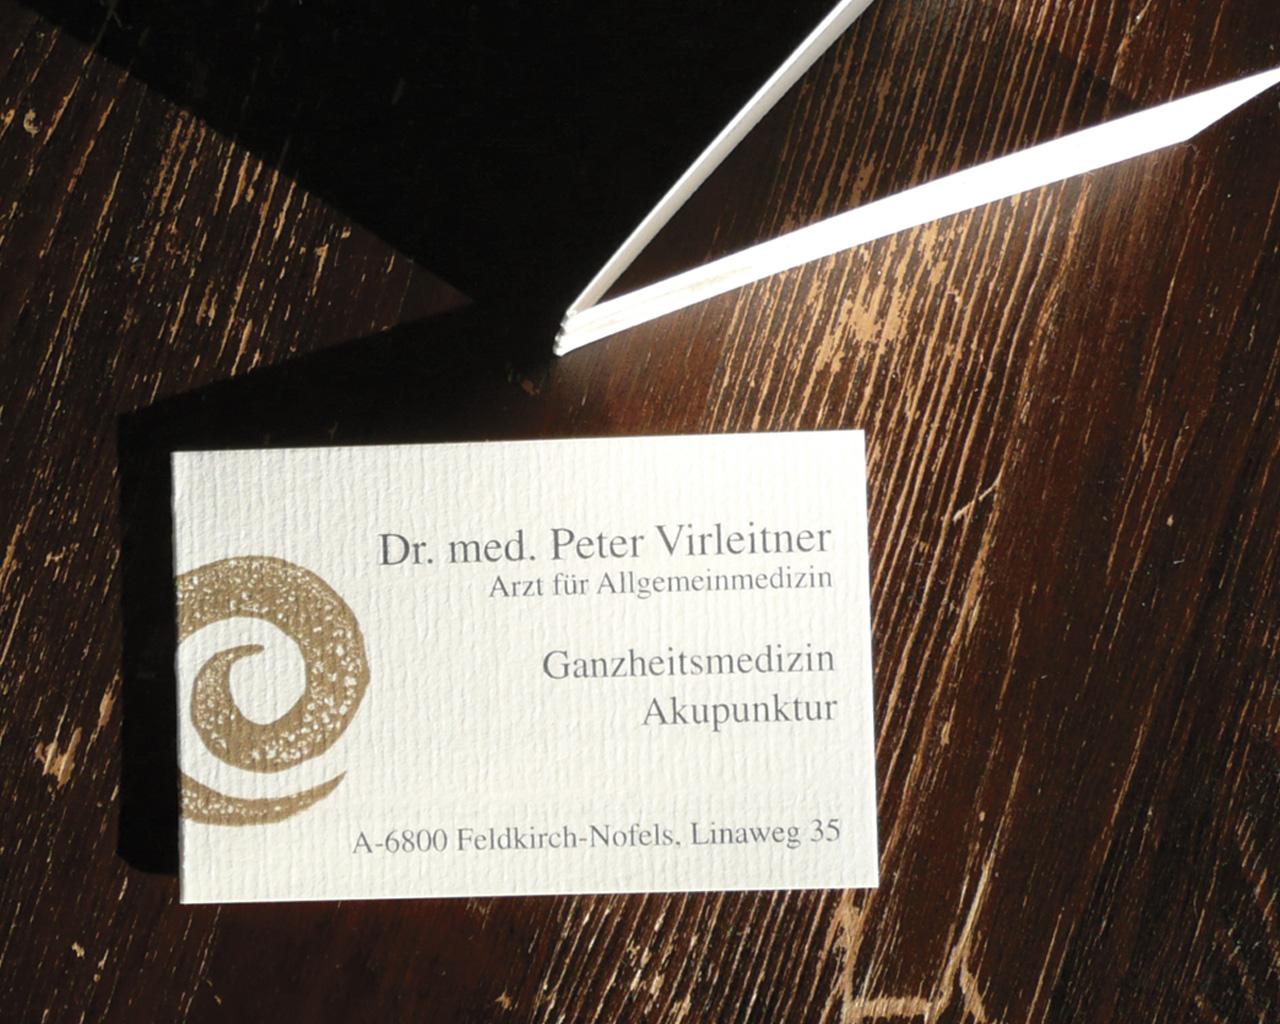 drmedpeter_unfoldedcardandfoldedcard